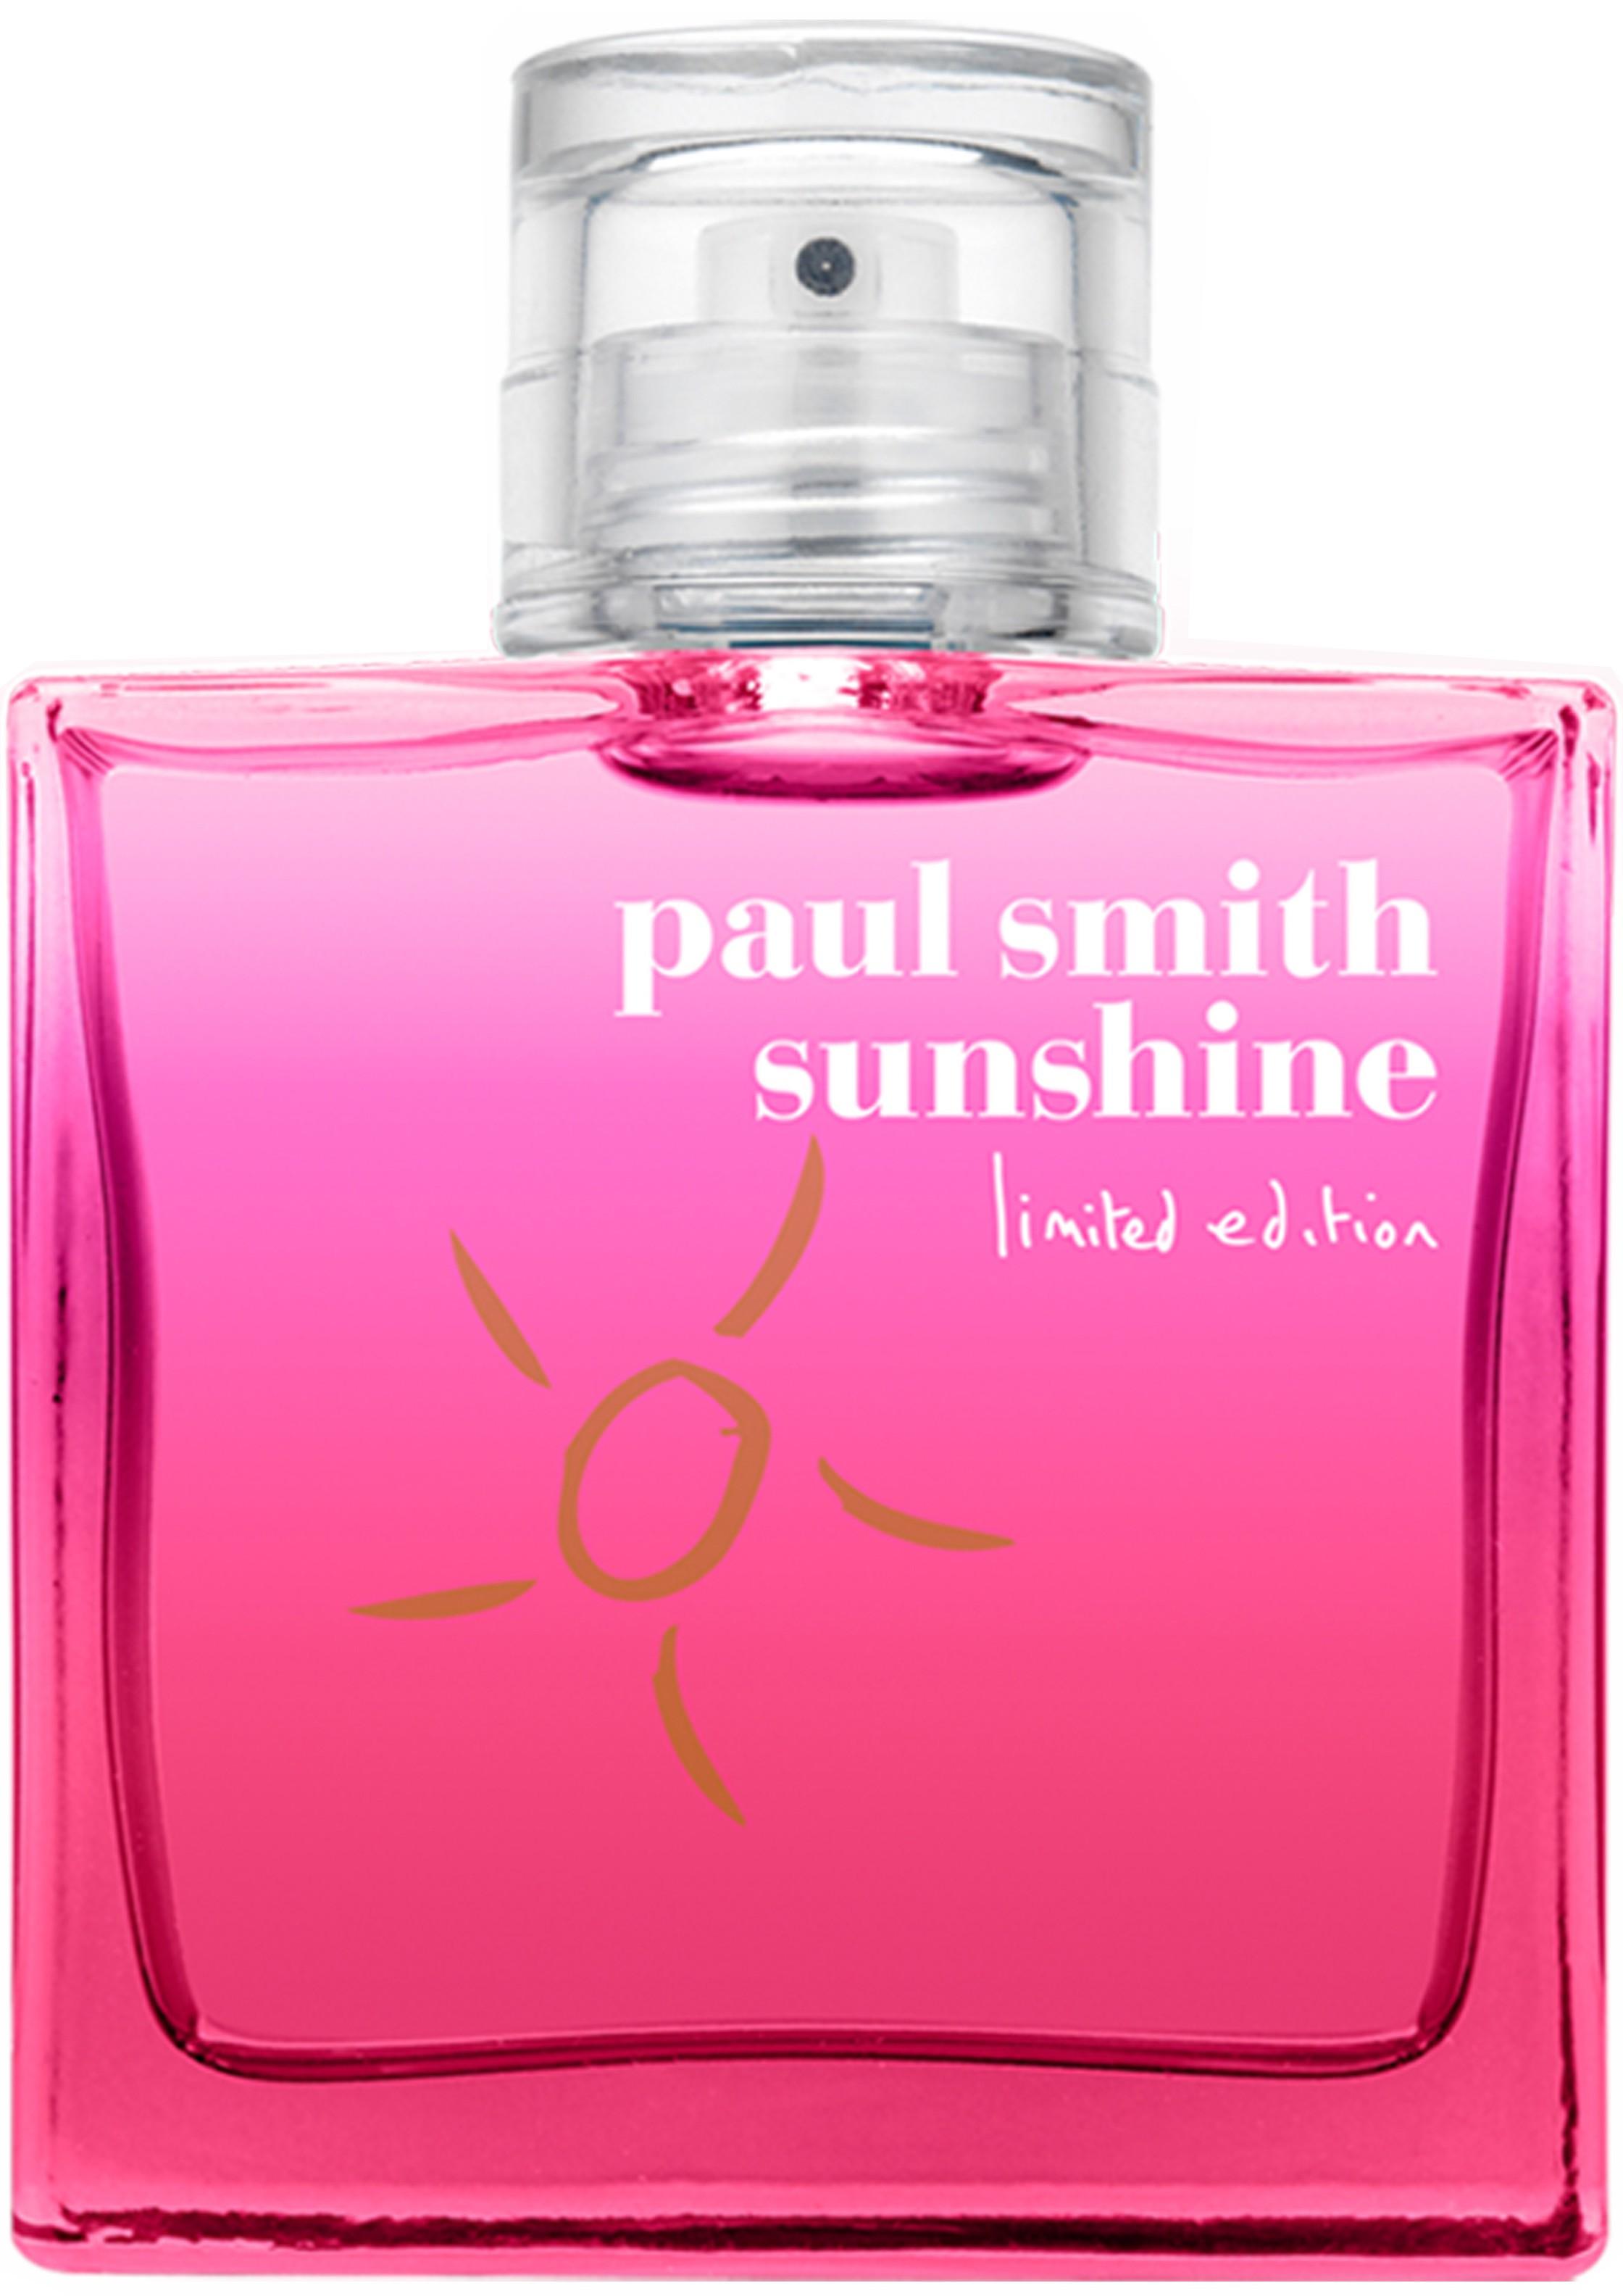 Paul Smith Sunshine Edition For Women 2014 аромат для женщин